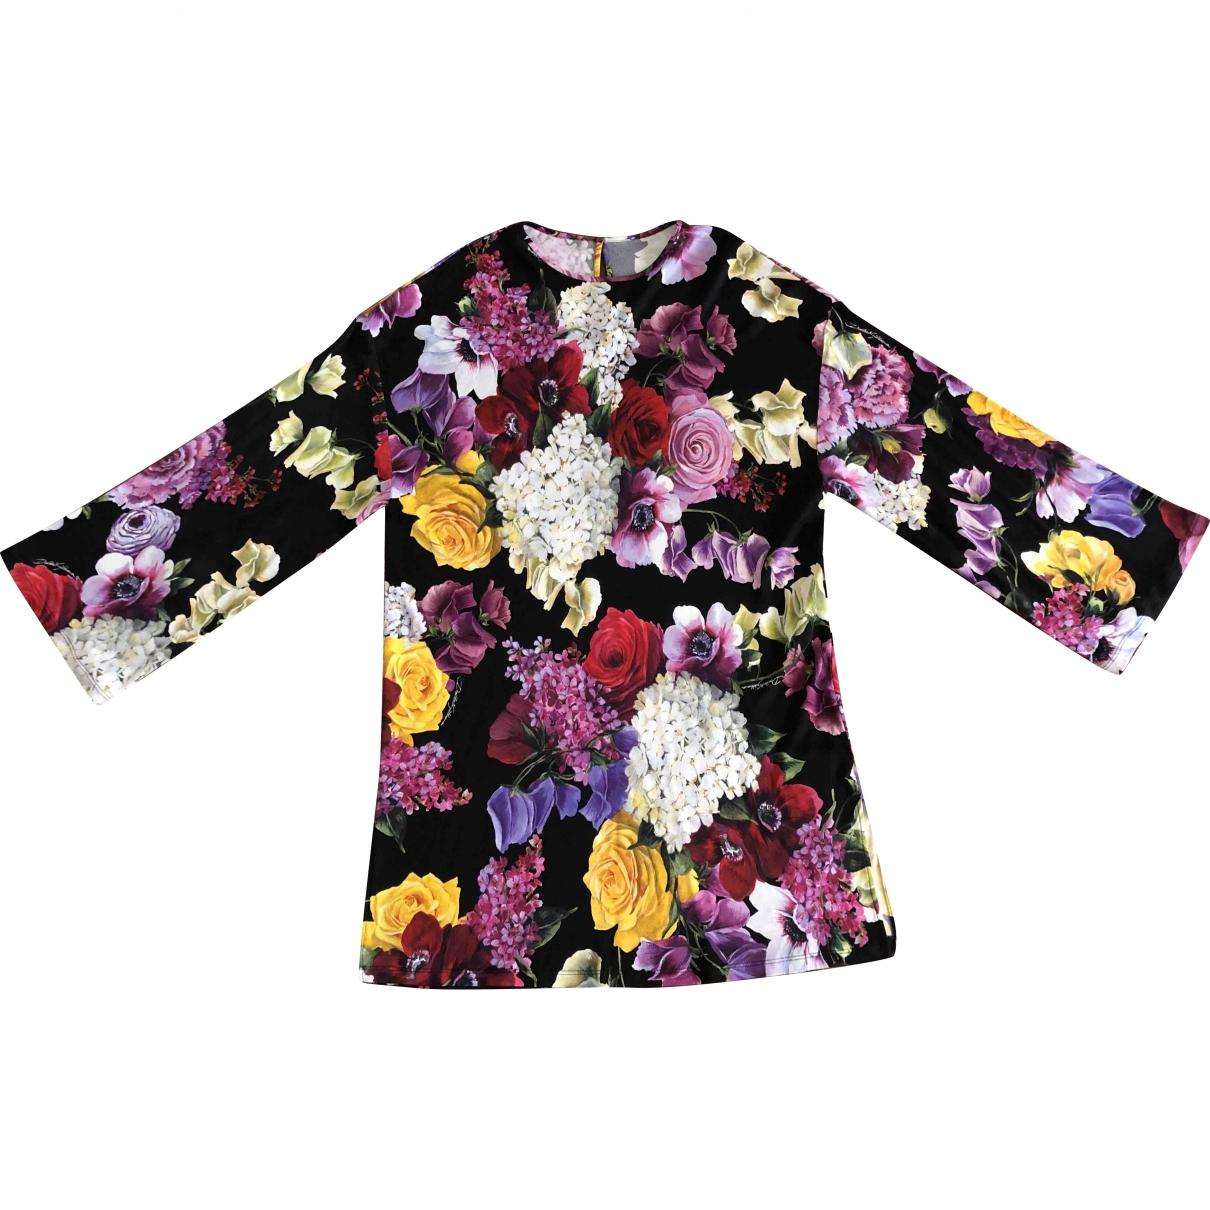 Dolce & Gabbana \N Top in  Bunt Viskose